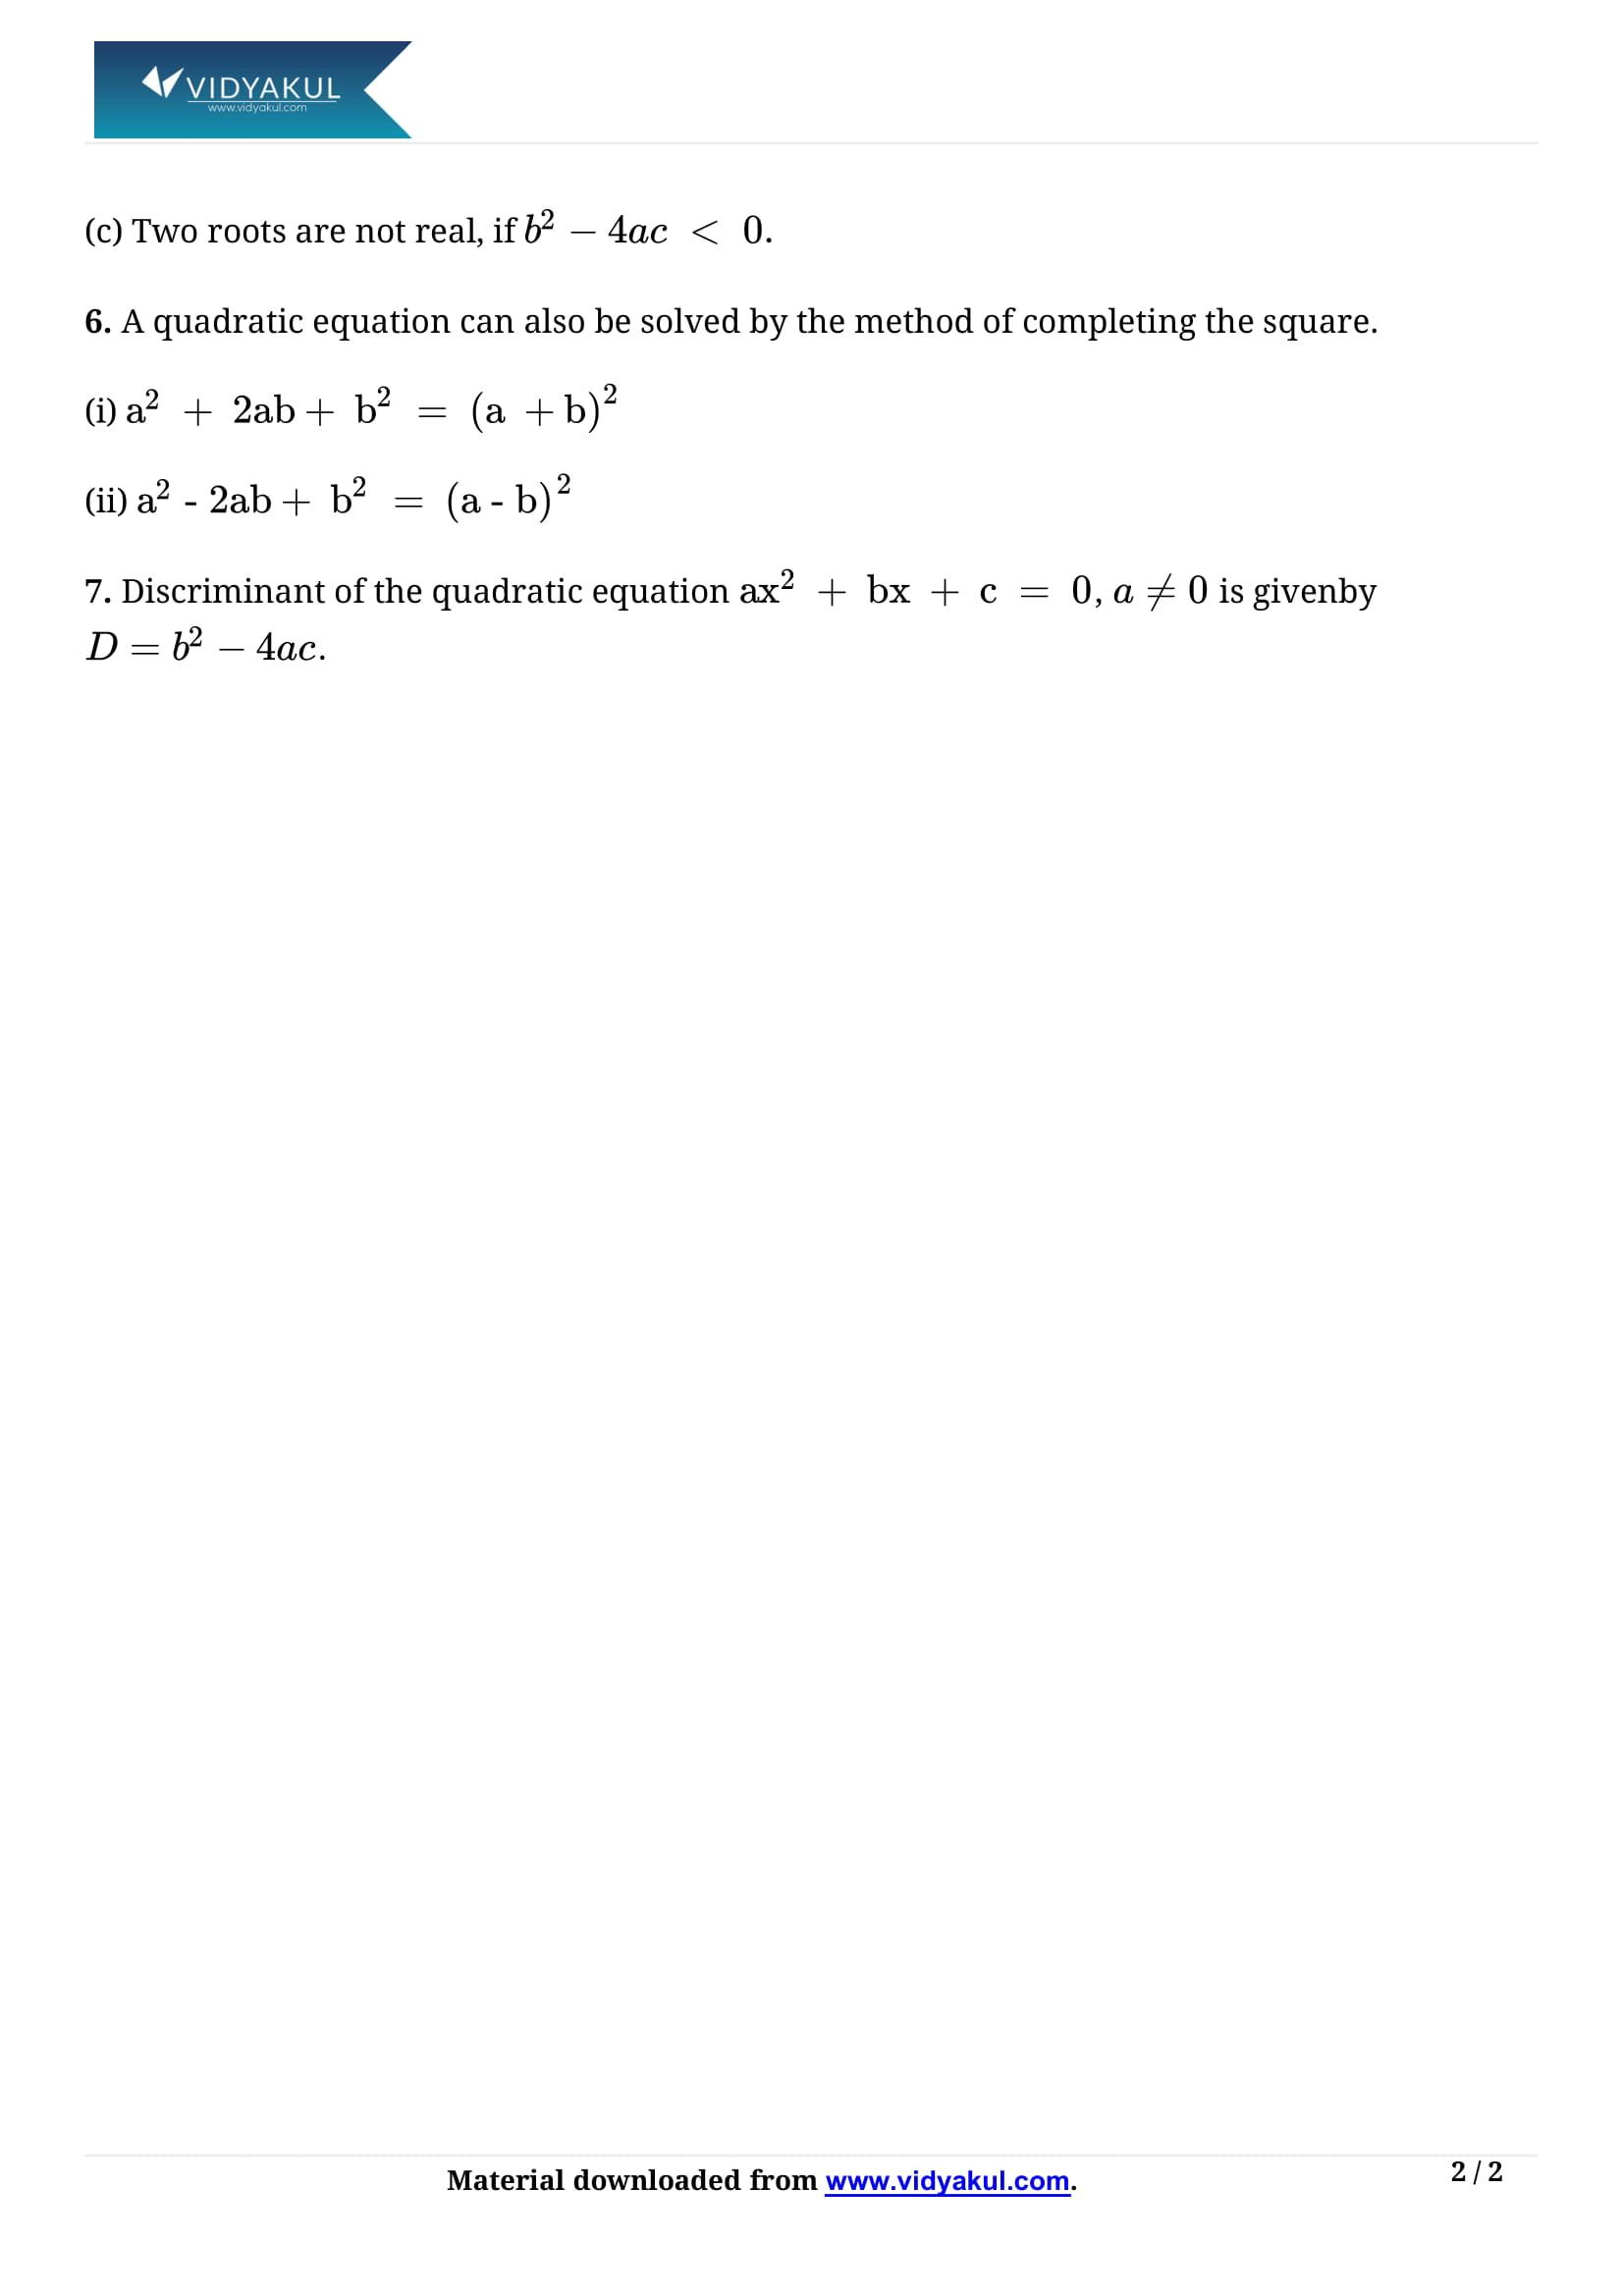 Quadratic Equations Class 10 Notes | Vidyakul